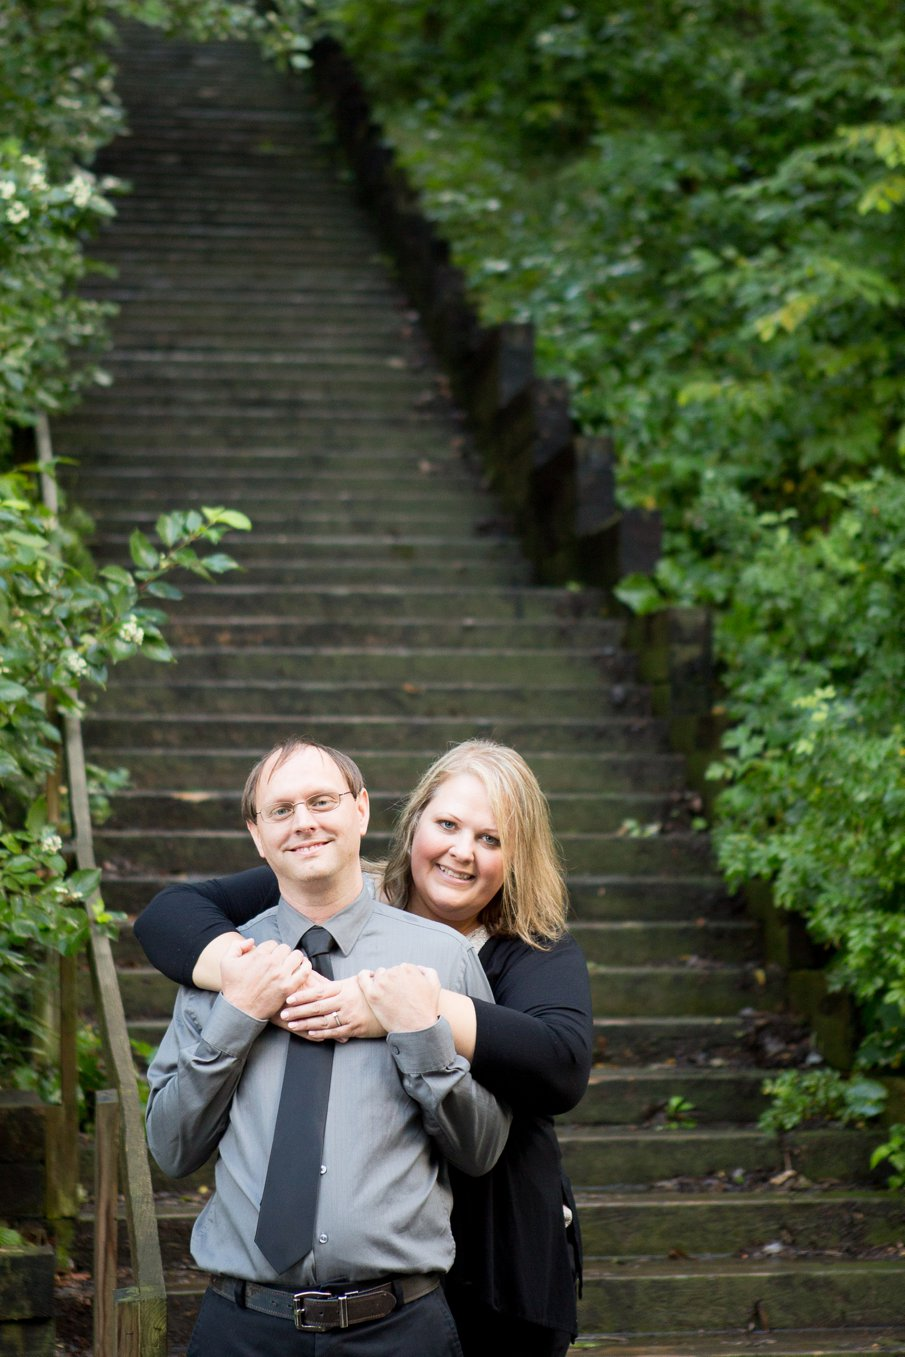 Alice Hq Photography | Amy + Eric | Mankato Engagement10.jpg